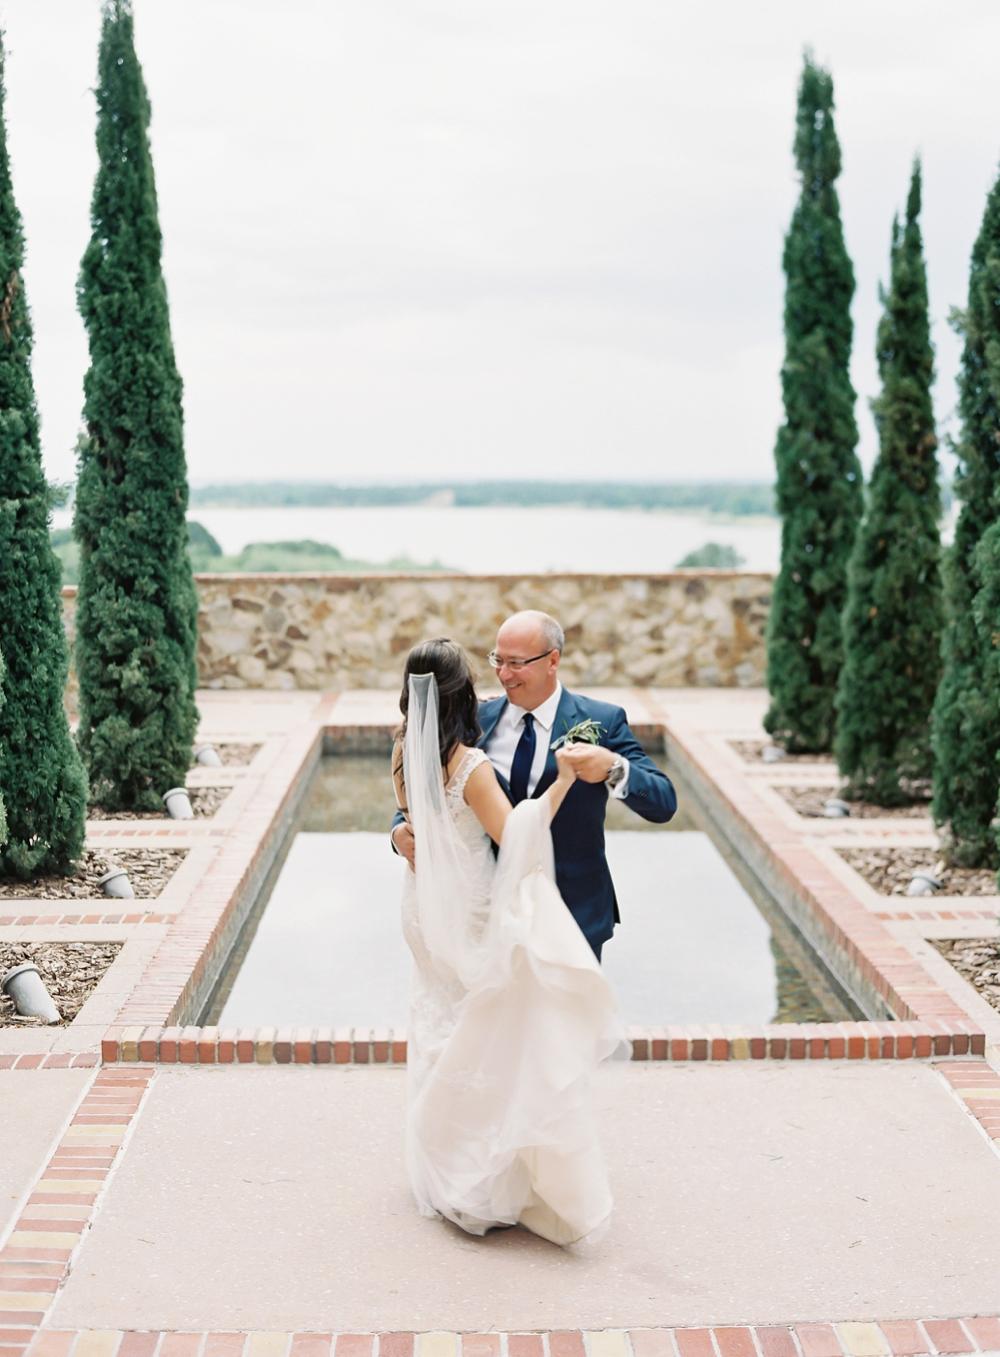 Vicki Grafton Photography - Fine Art Film Wedding Photographer - Bella Collina Wedding_0068.jpg